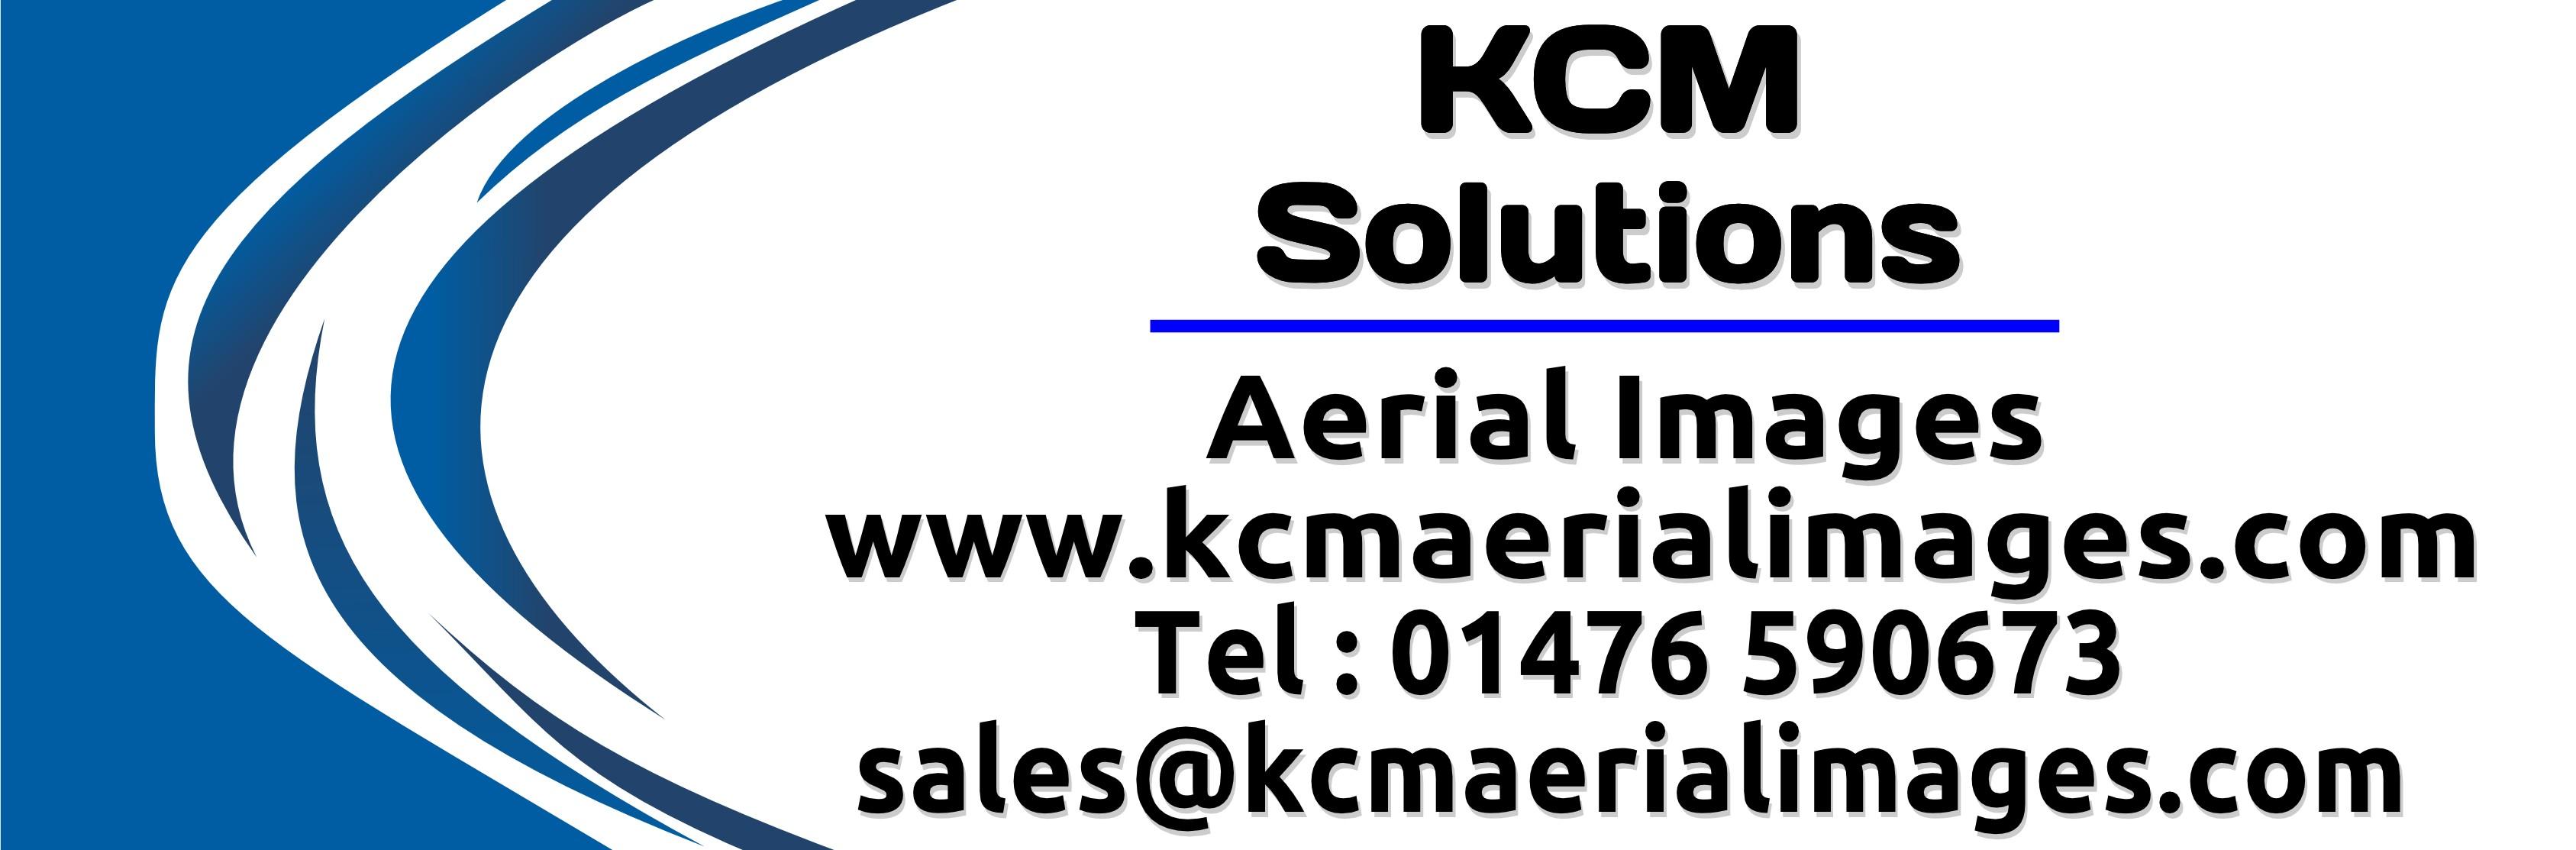 KCM Graphics & KCM Aerial Images - Hereford, Herefordshire HR2 9RX - 07823 344044 | ShowMeLocal.com